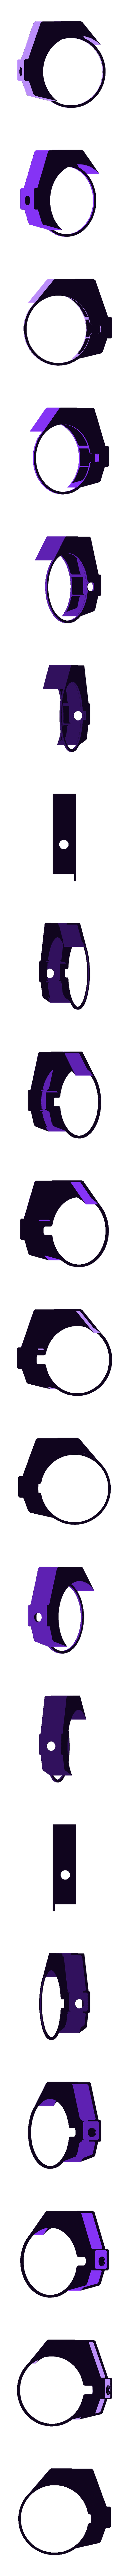 rotary-case-flip.stl Download free 3MF file Watchmen NeoPixel Goggles • 3D printable model, Adafruit